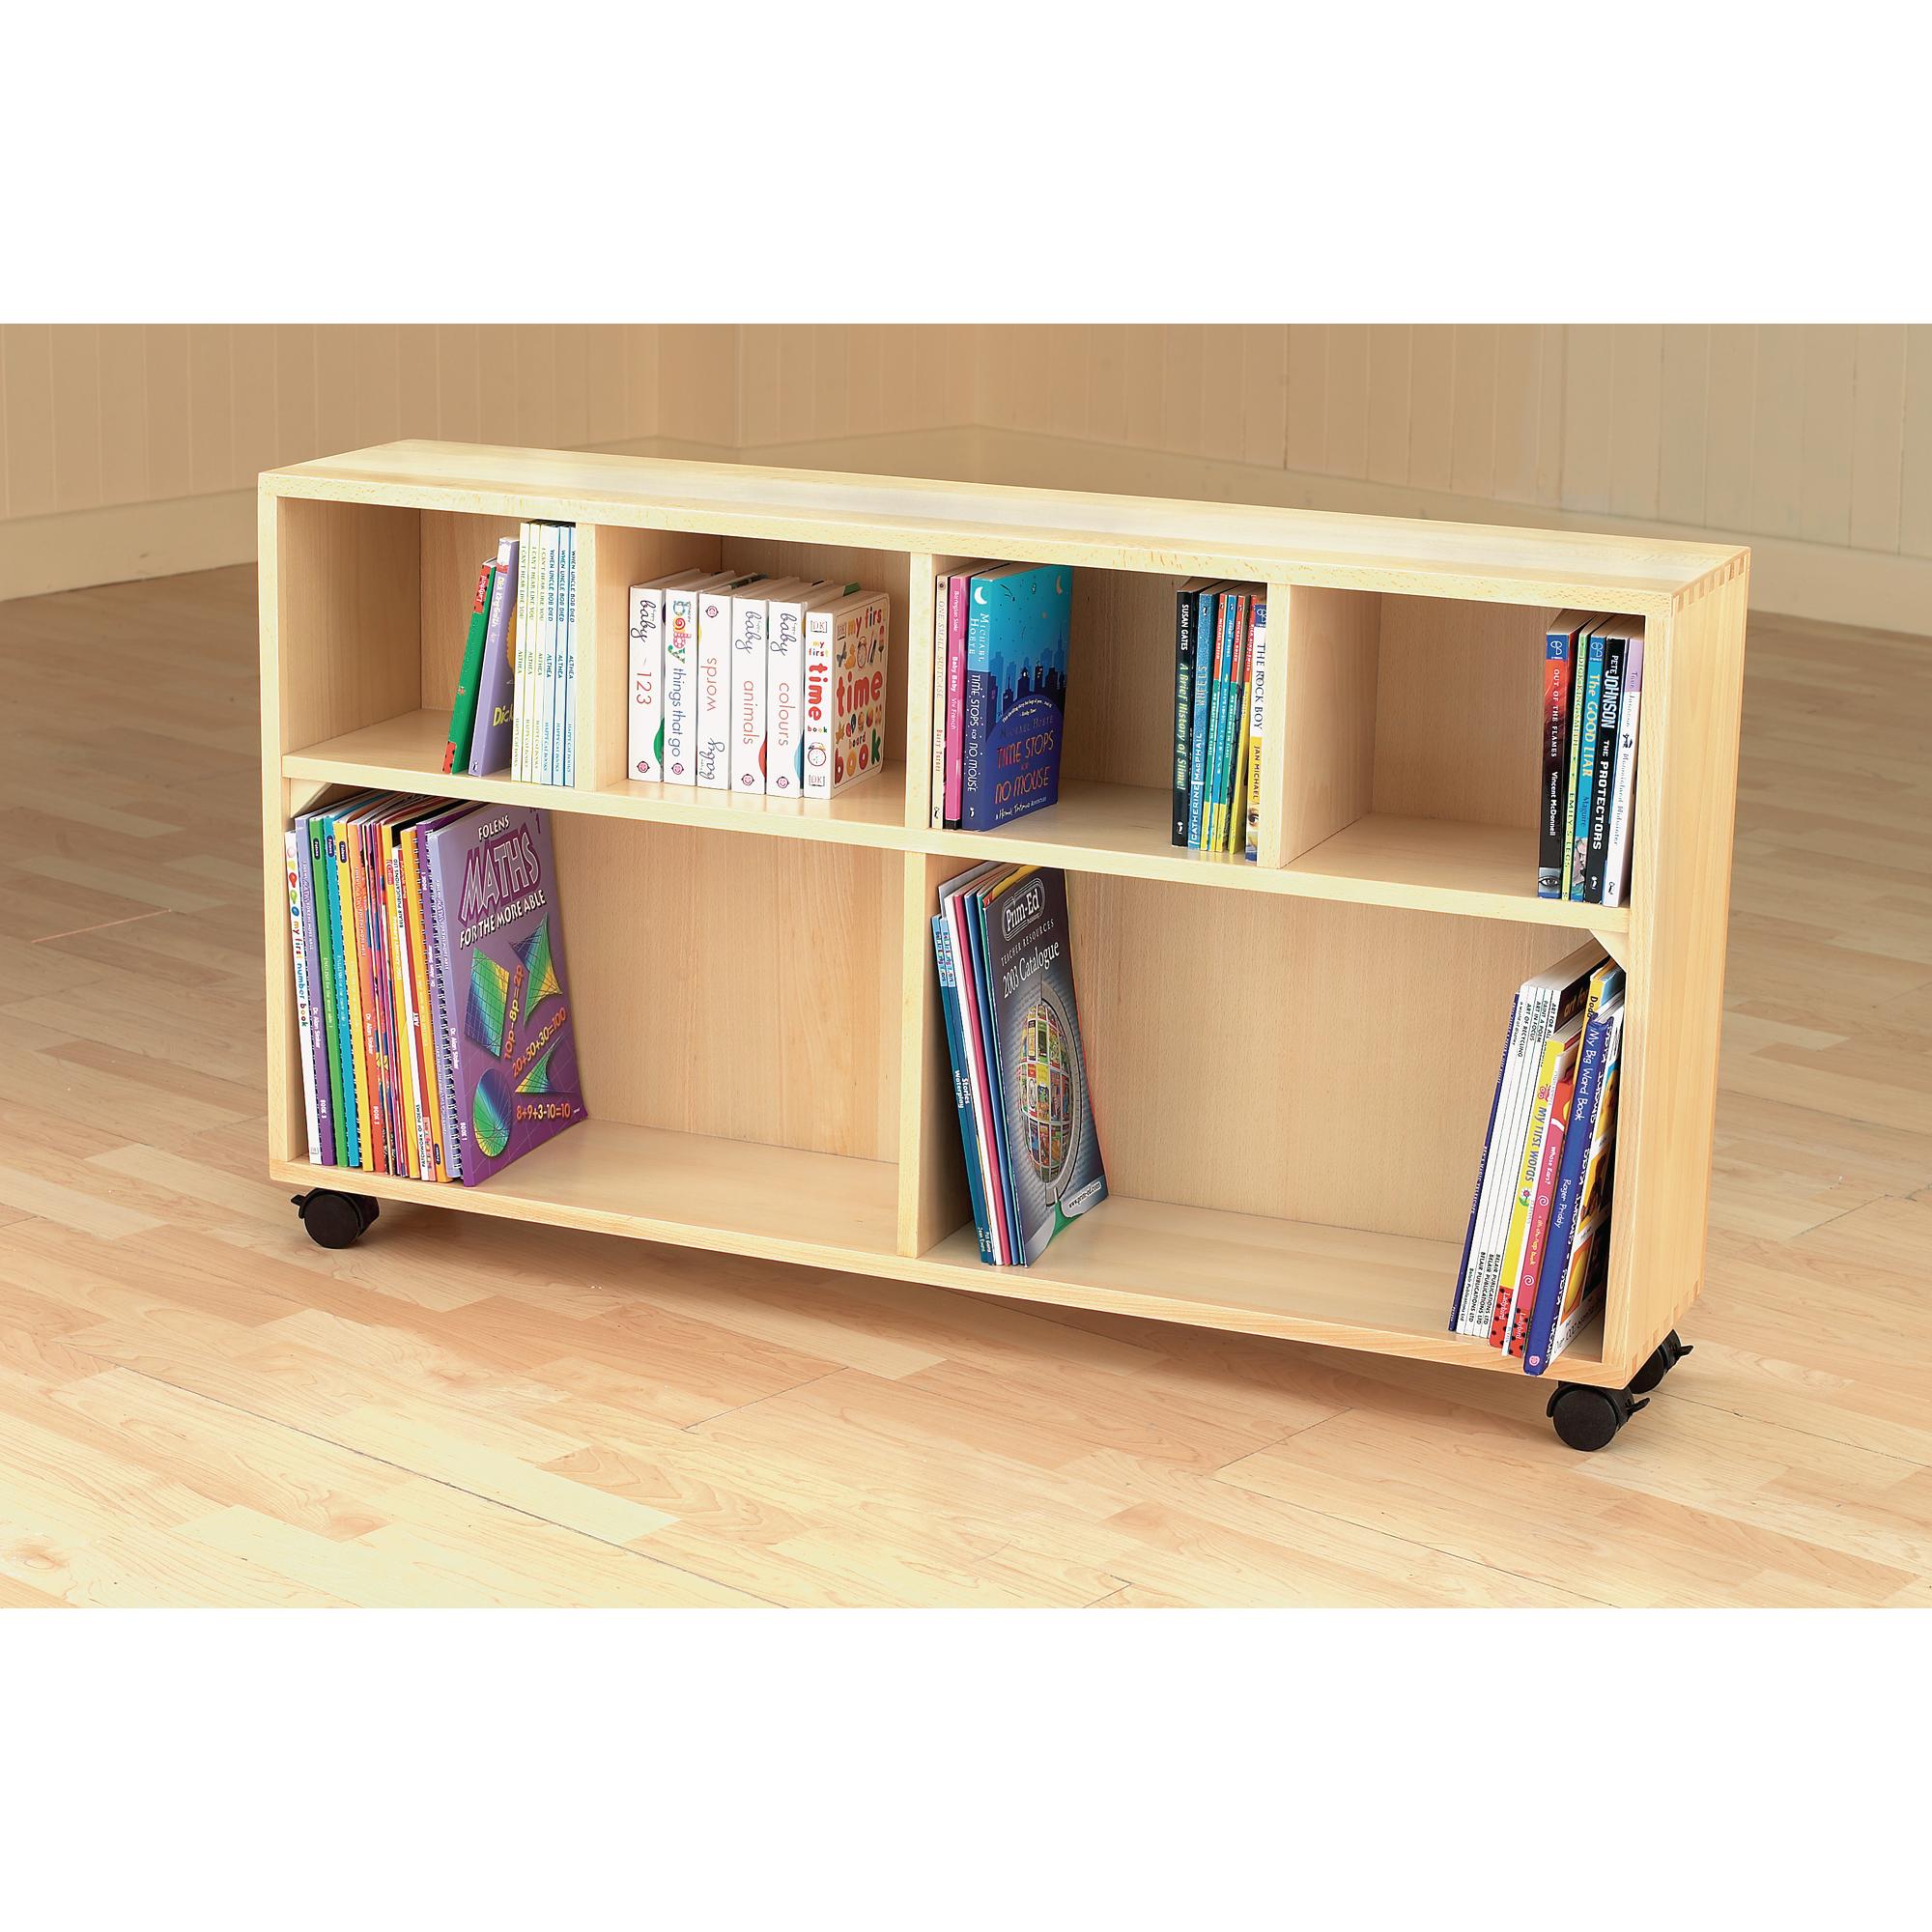 bookshelf product hand bookcase sqbl furniturendecor dollhouse love birds com painted ukid baby